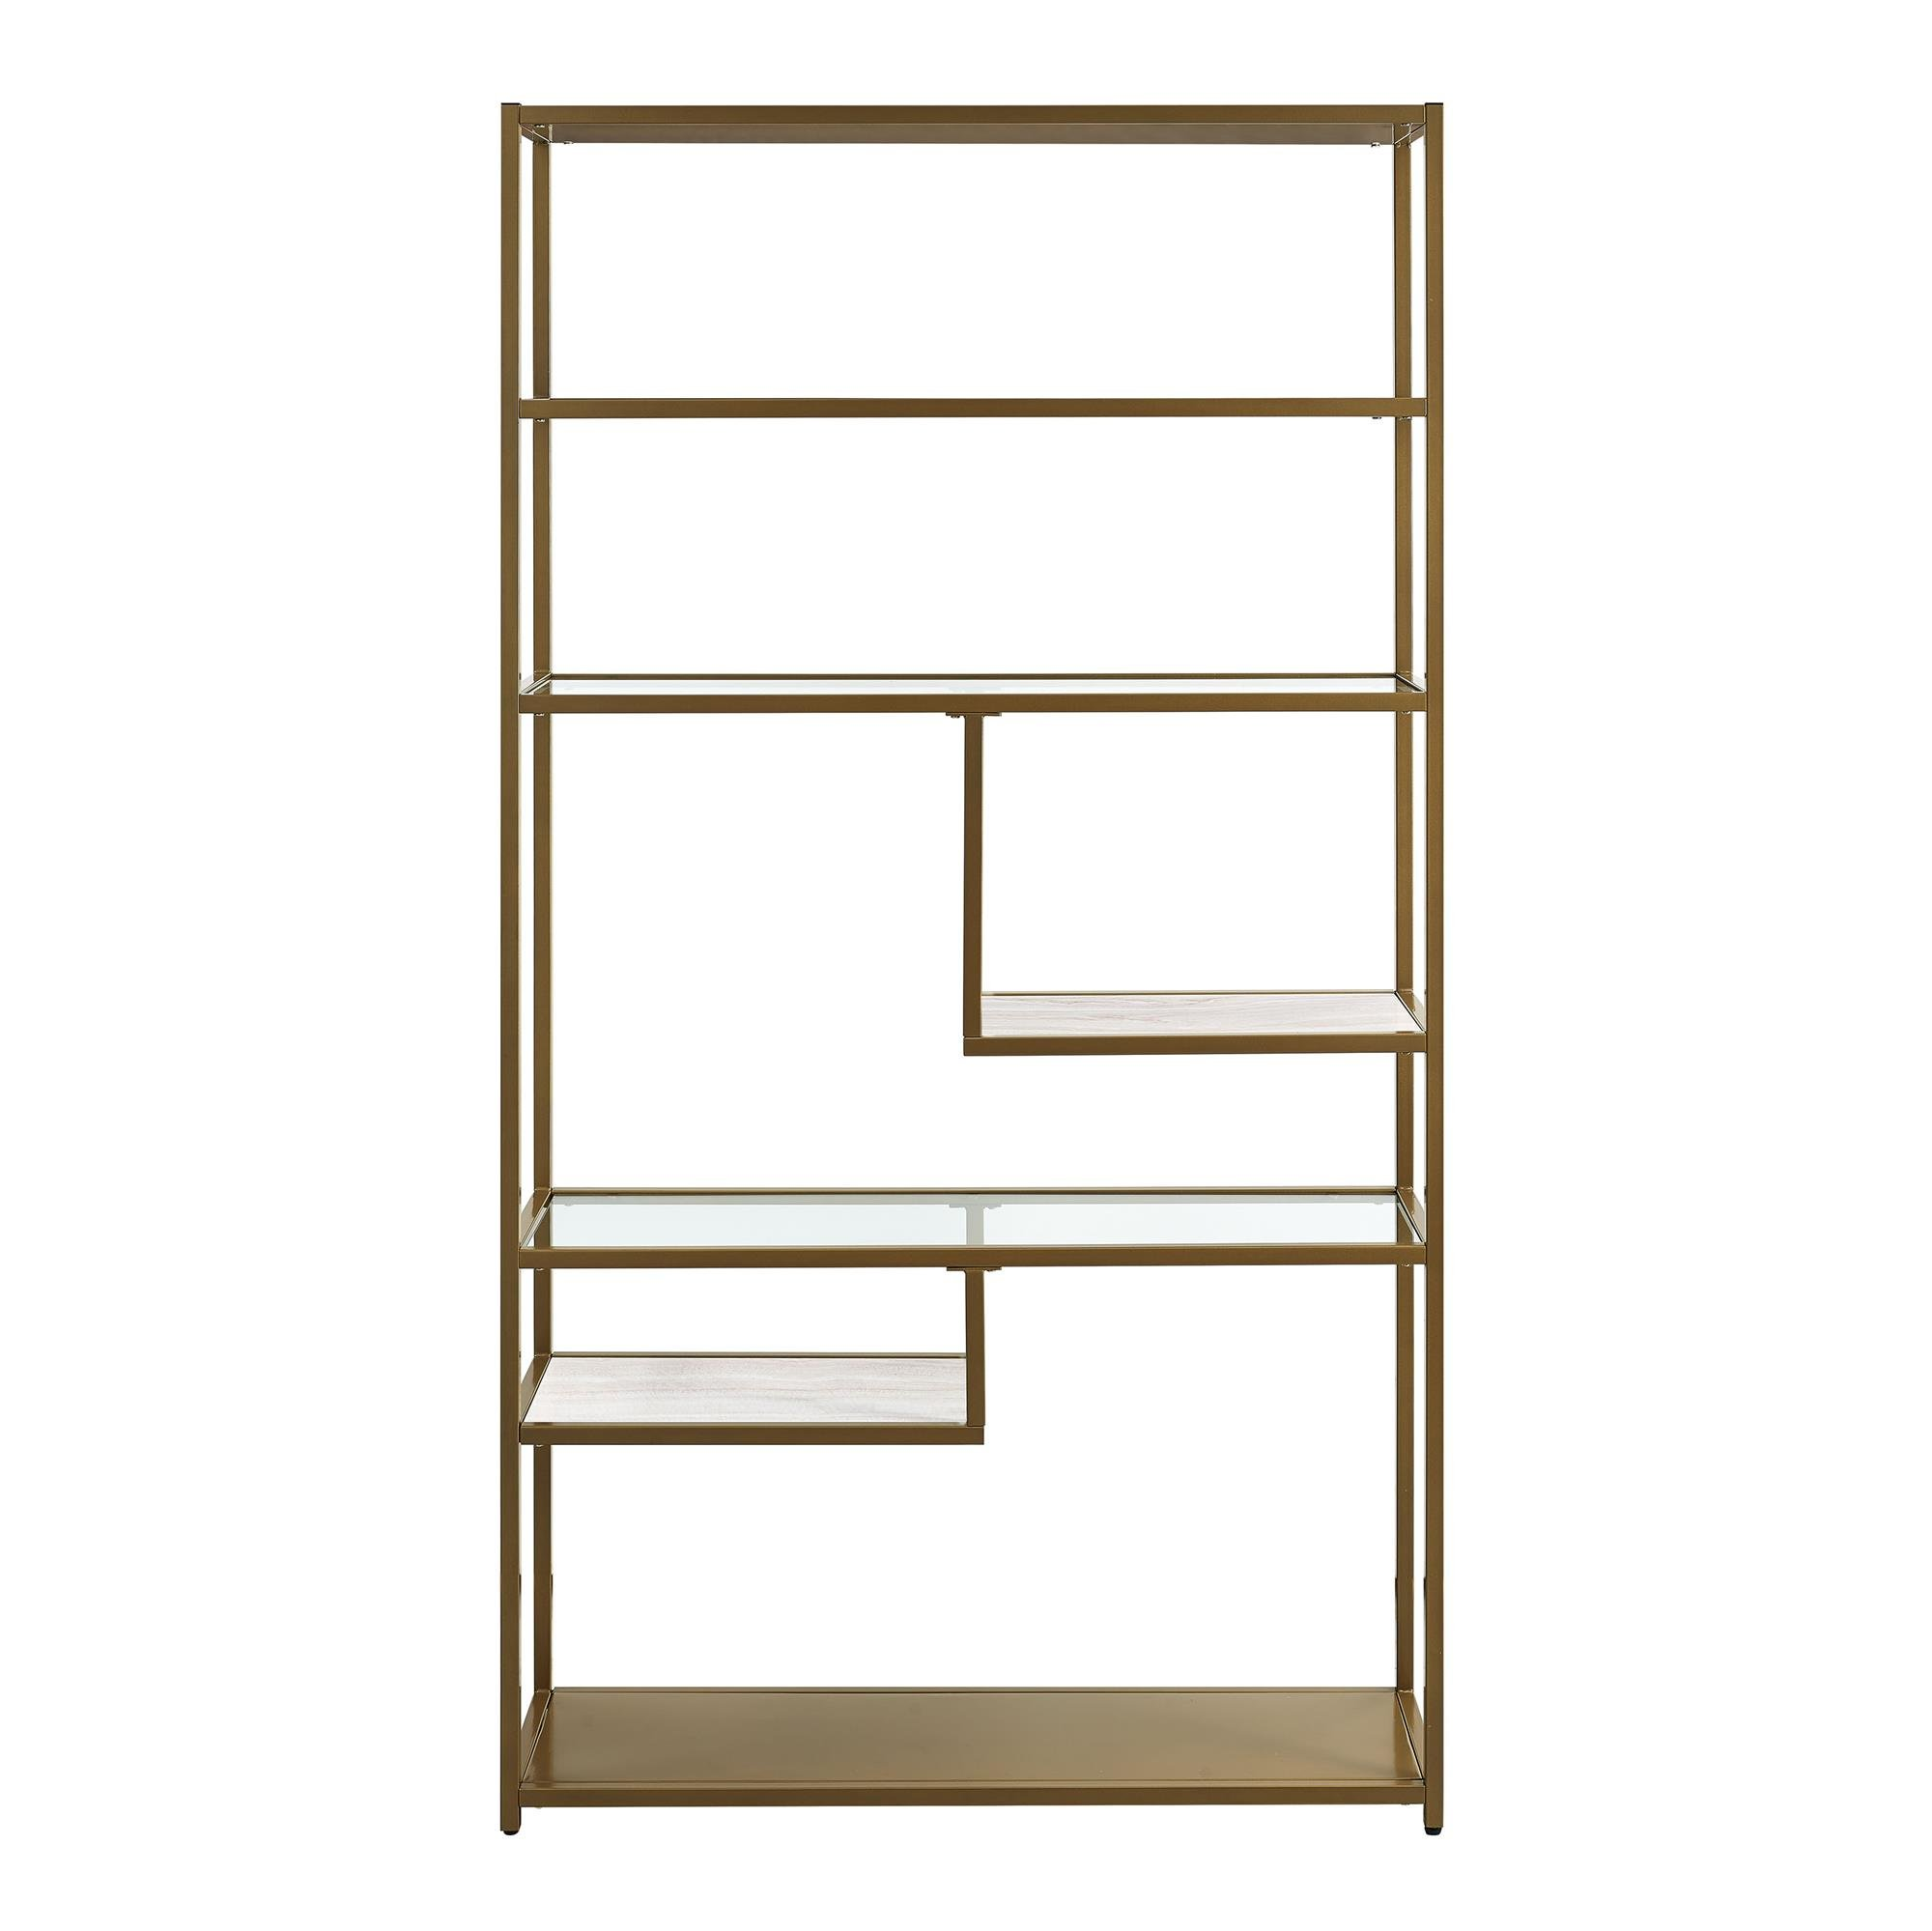 Dorel Living Moriah Geometric Bookcase Etagere, Soft Brass